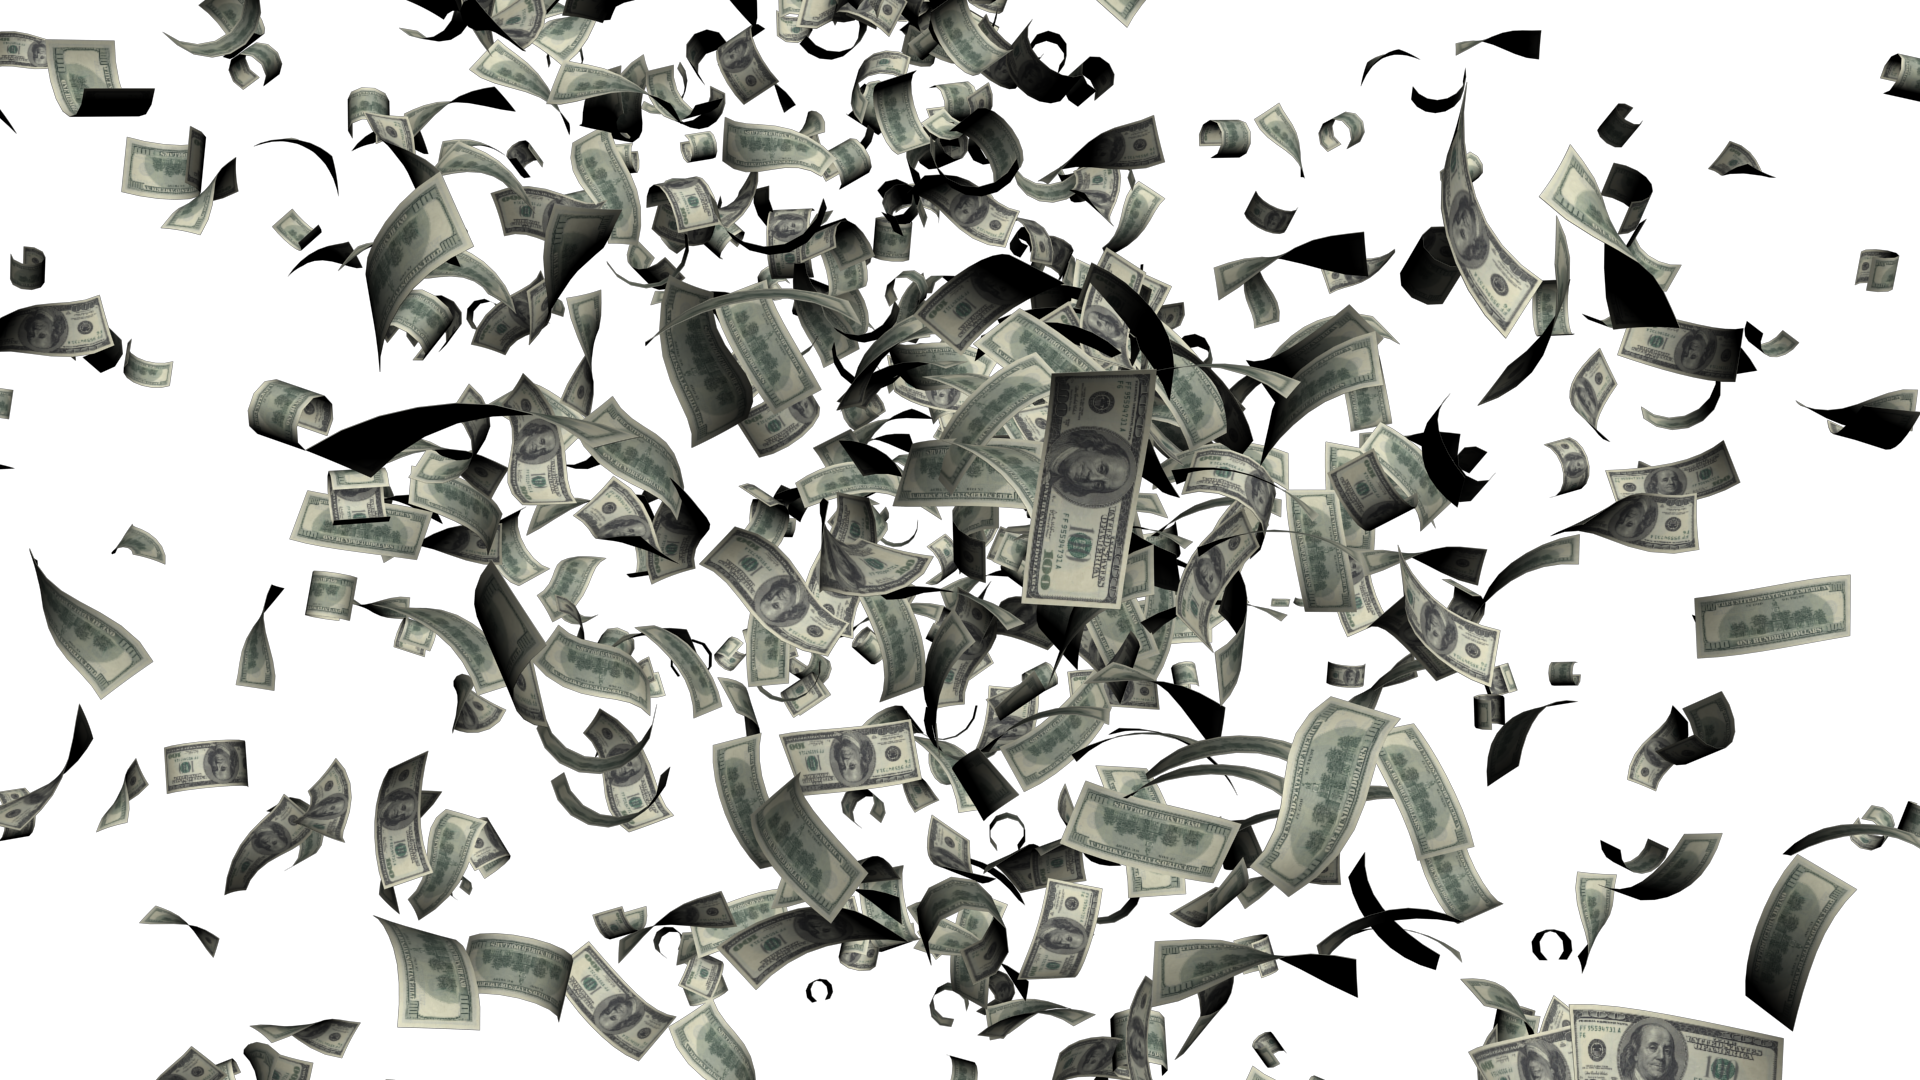 Raining money png. Falling images free download